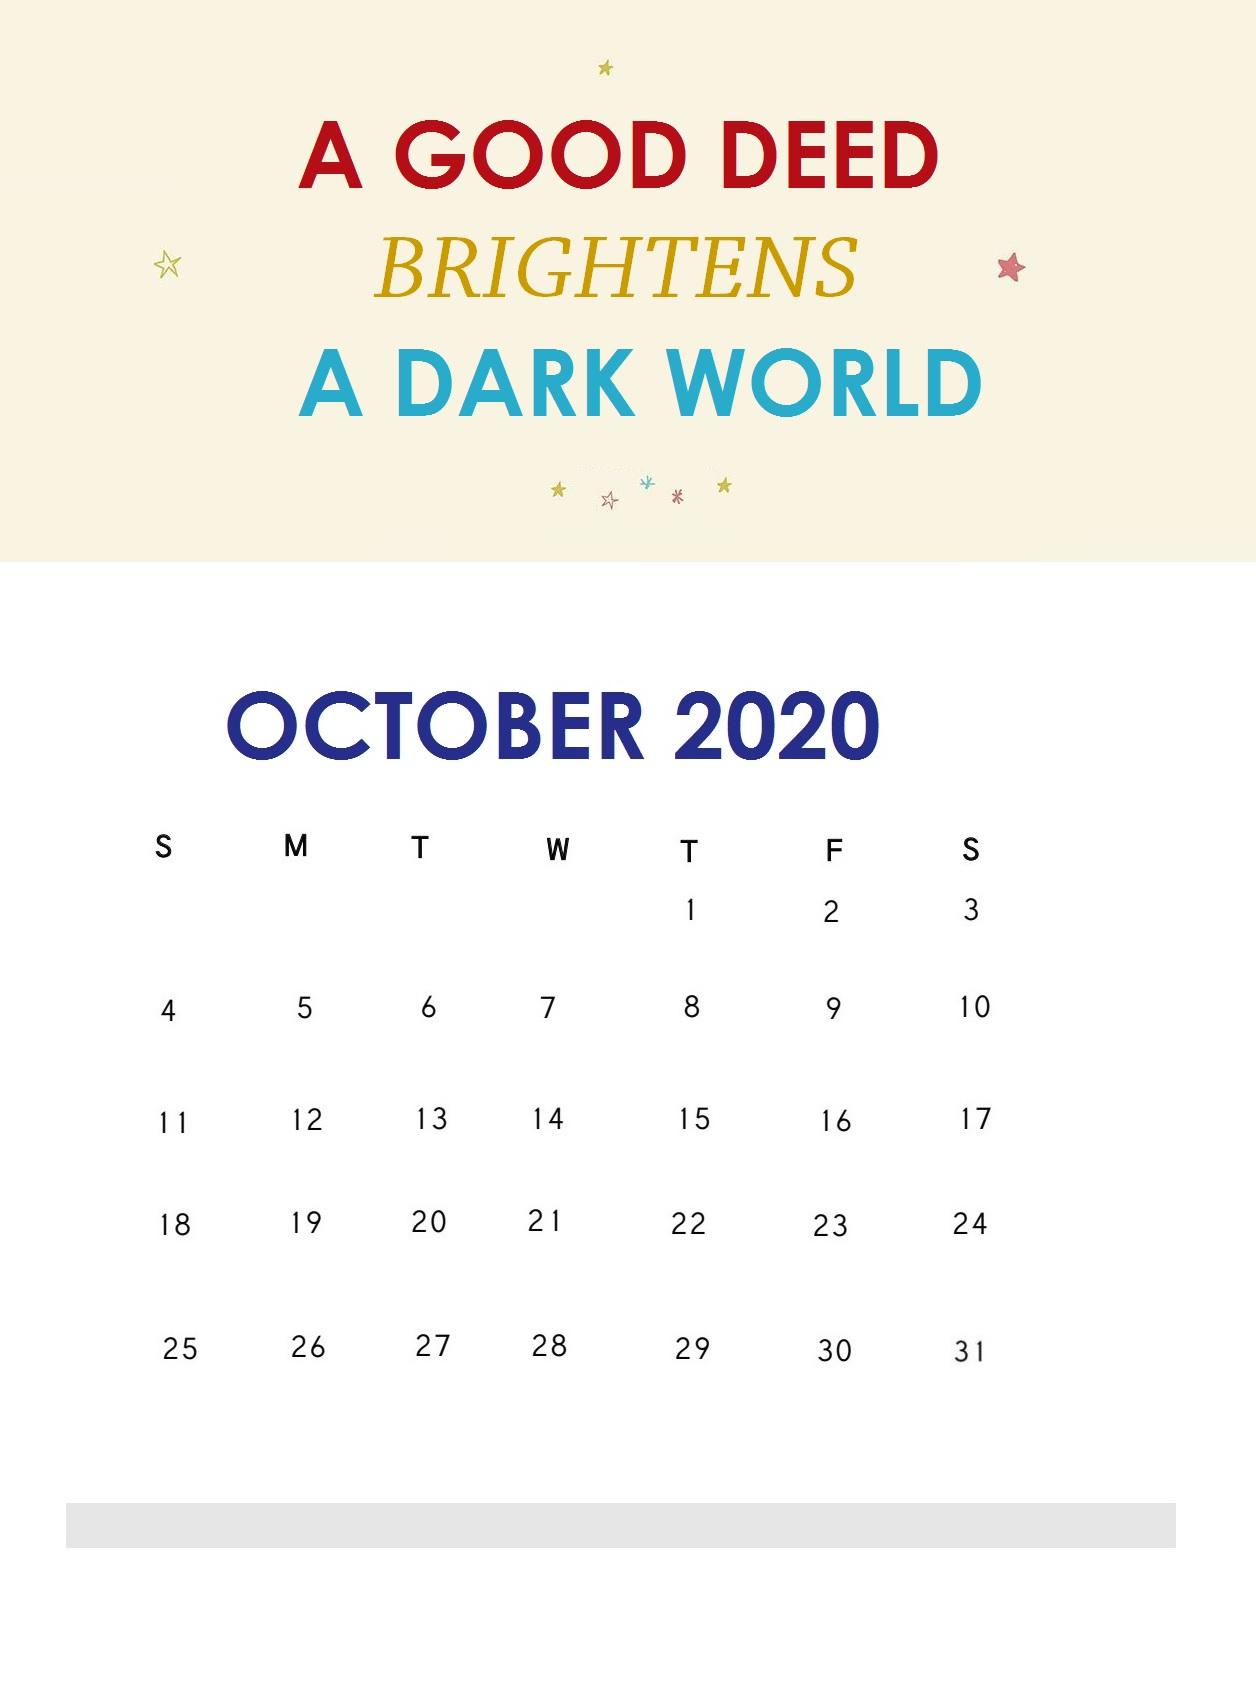 Inspiring October 2020 Quotes Calendar